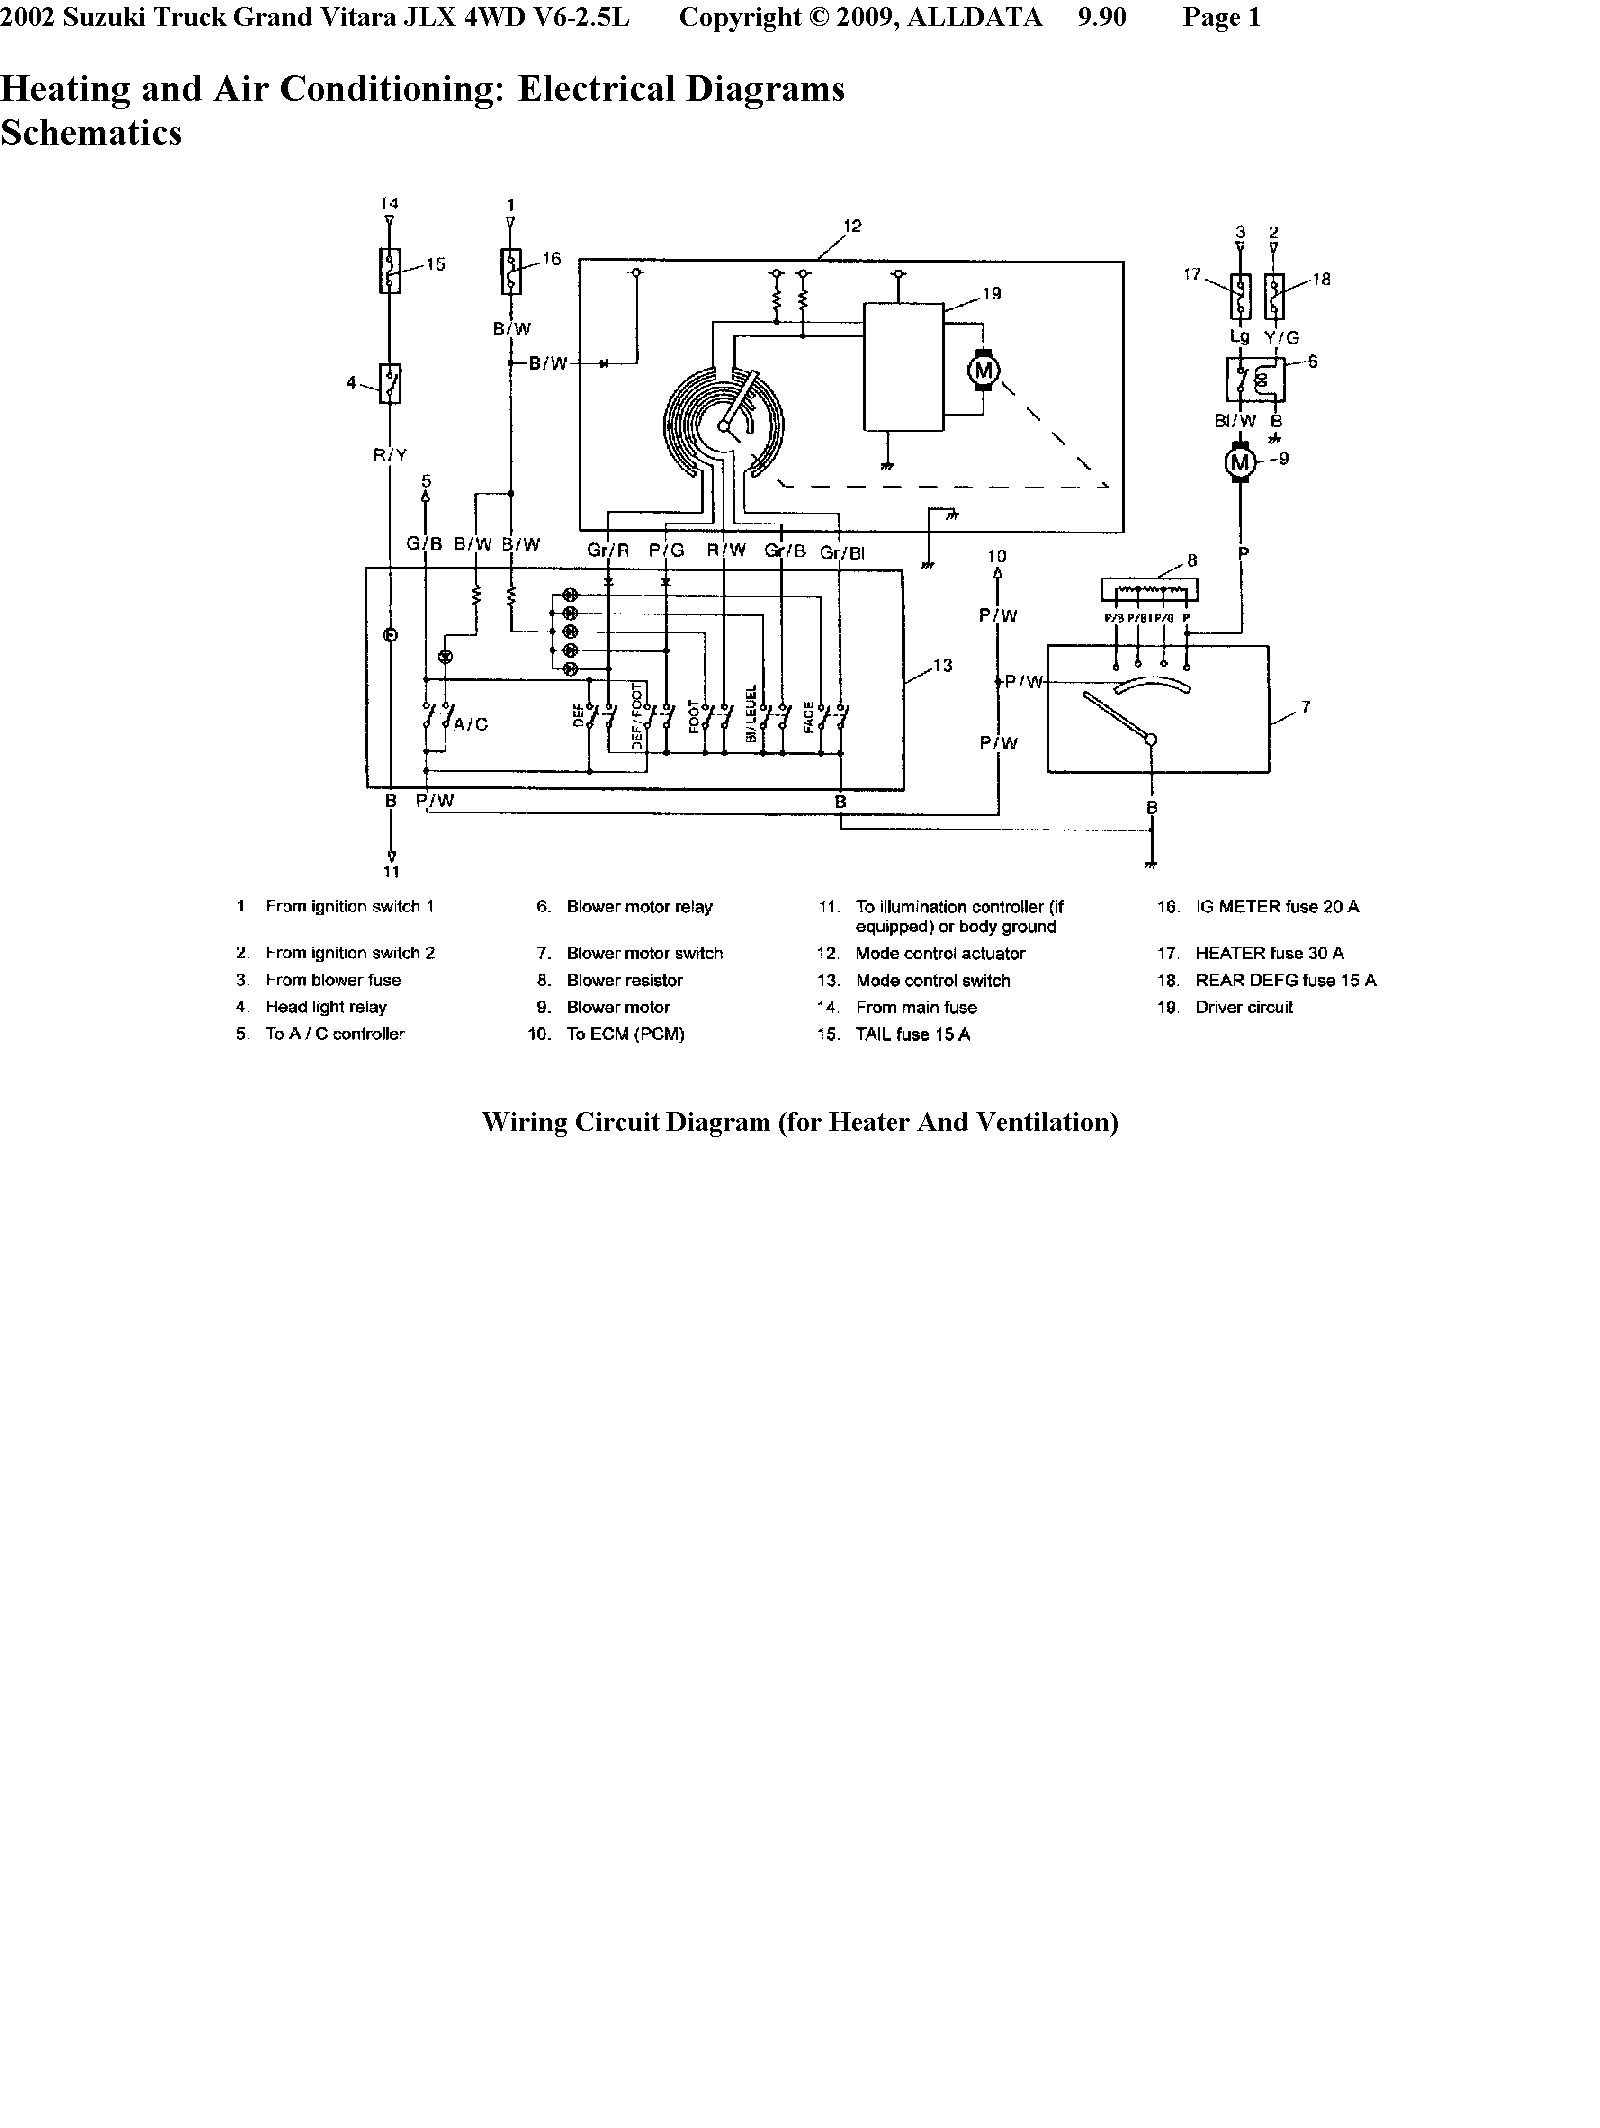 Wiring diagram for suzuki grand vitara get free image